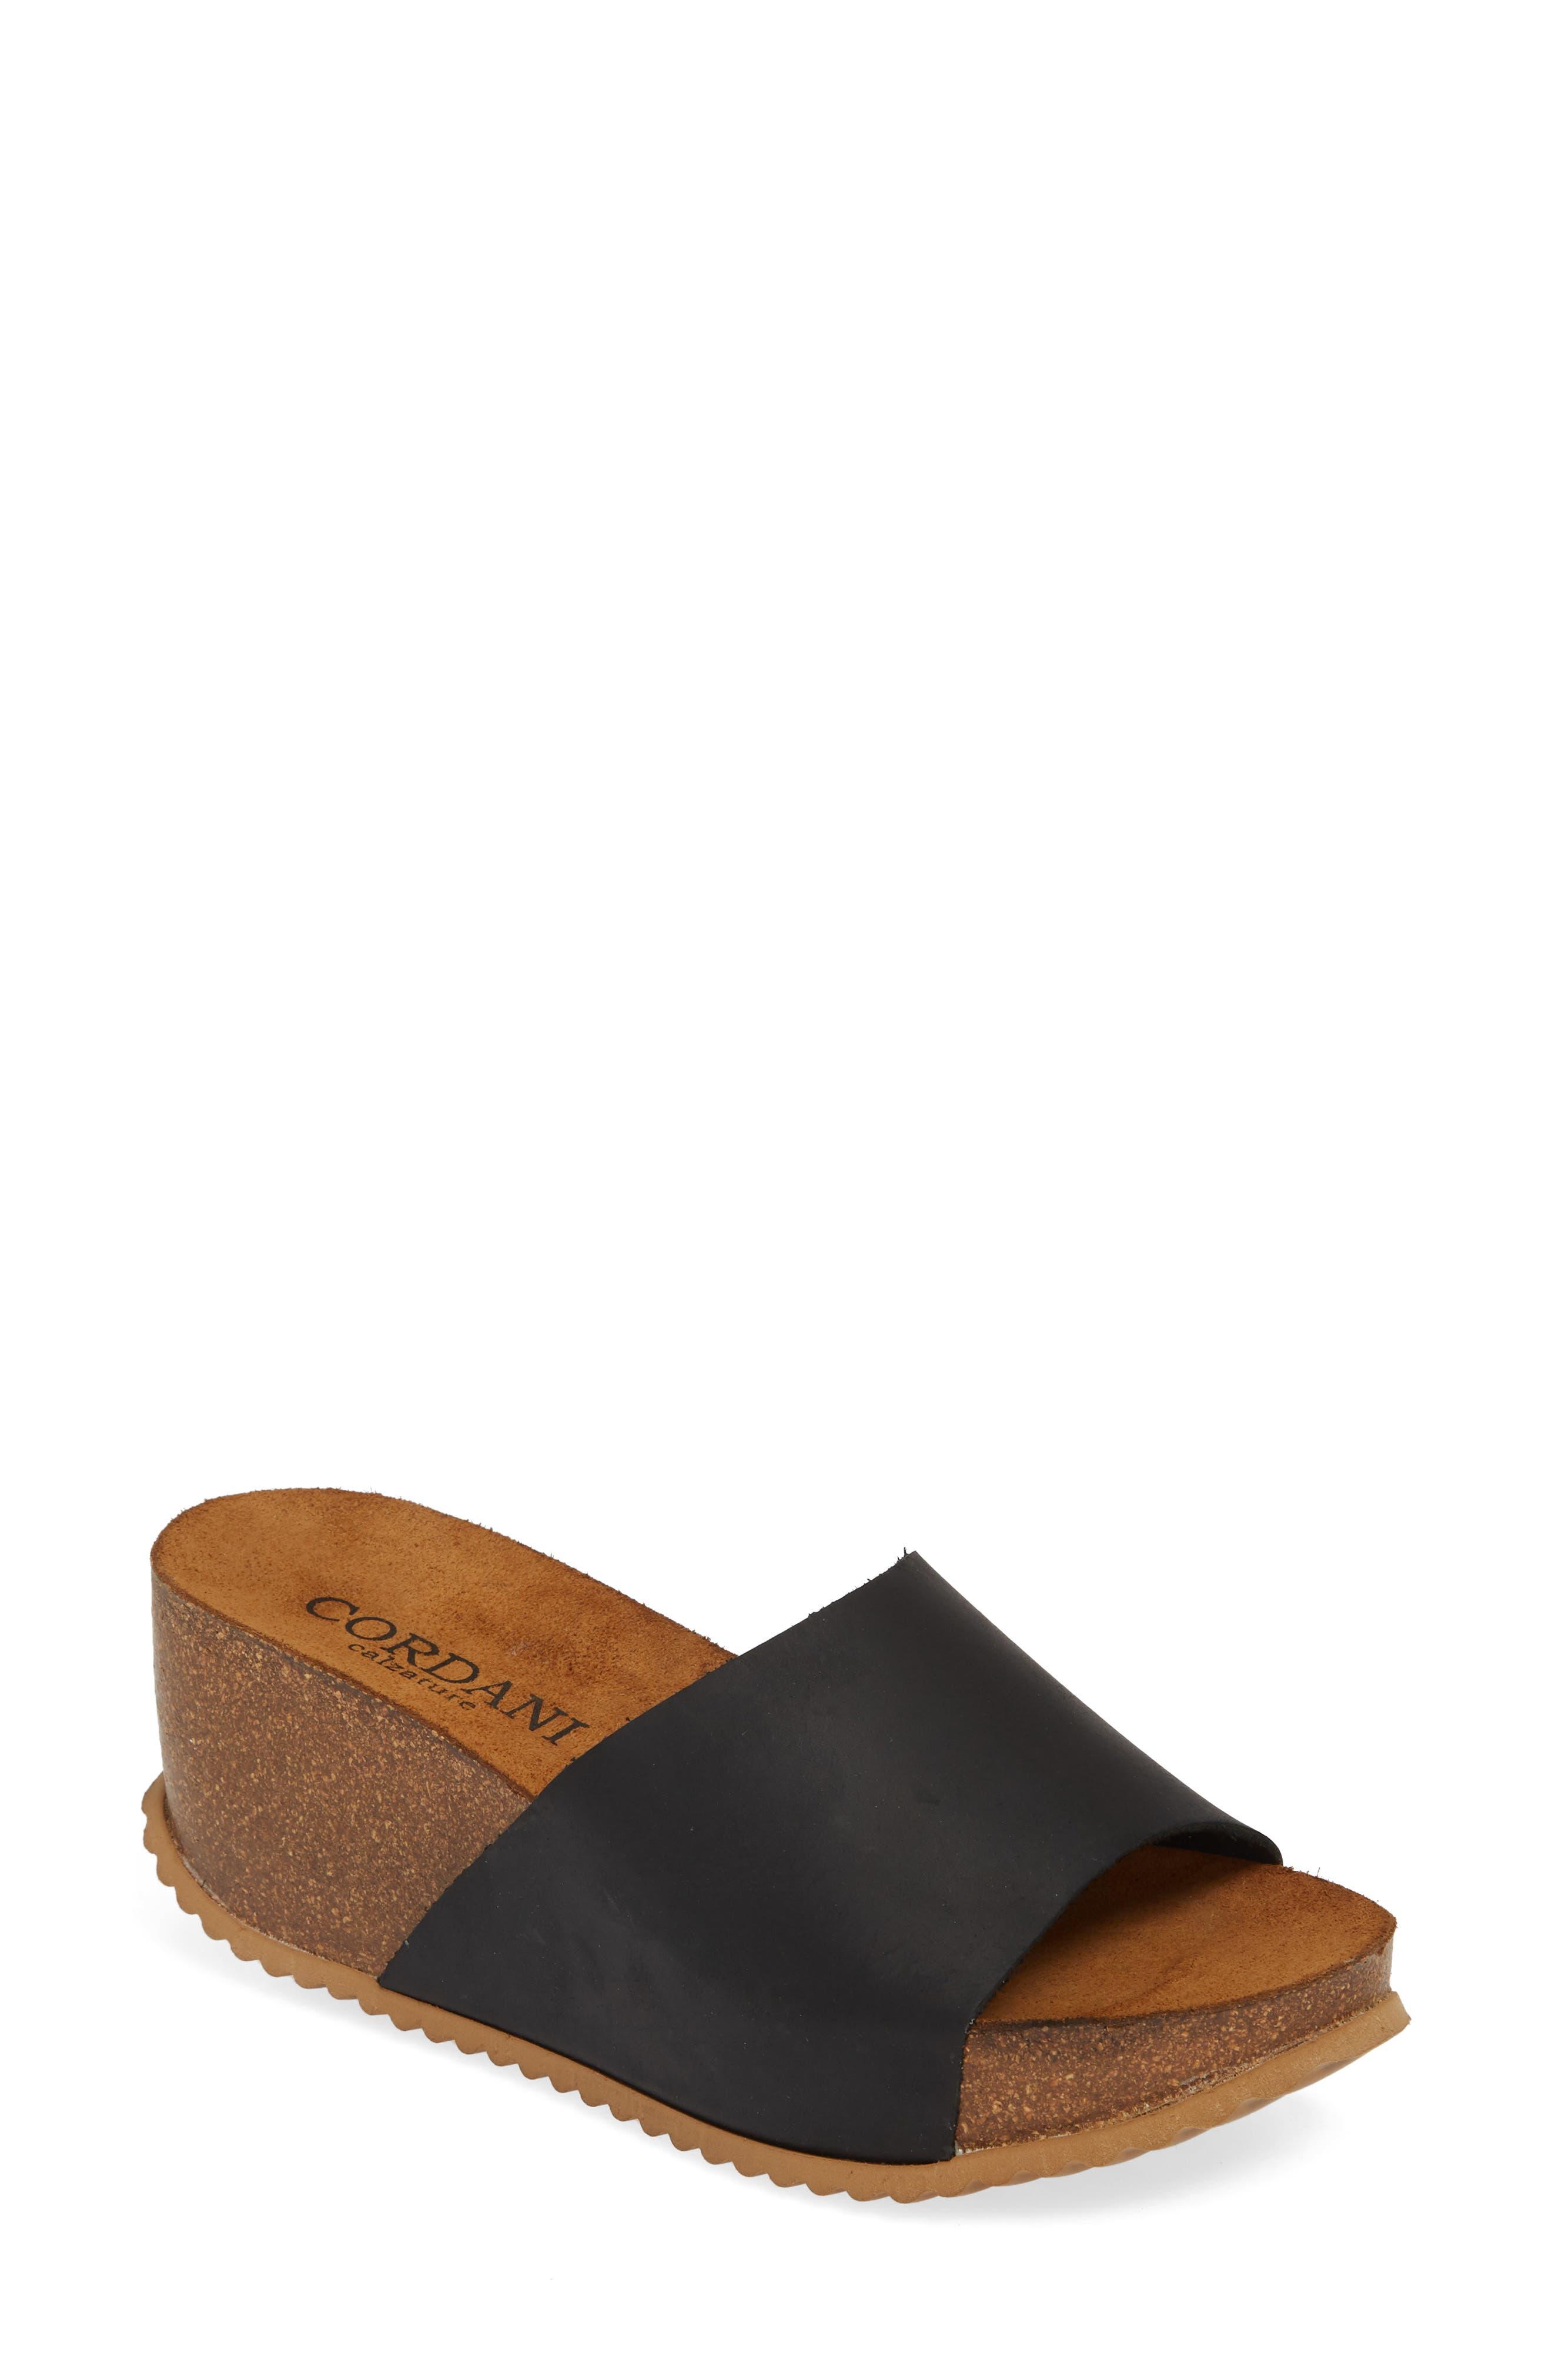 Cordani Margie Wedge Slide Sandal - Black